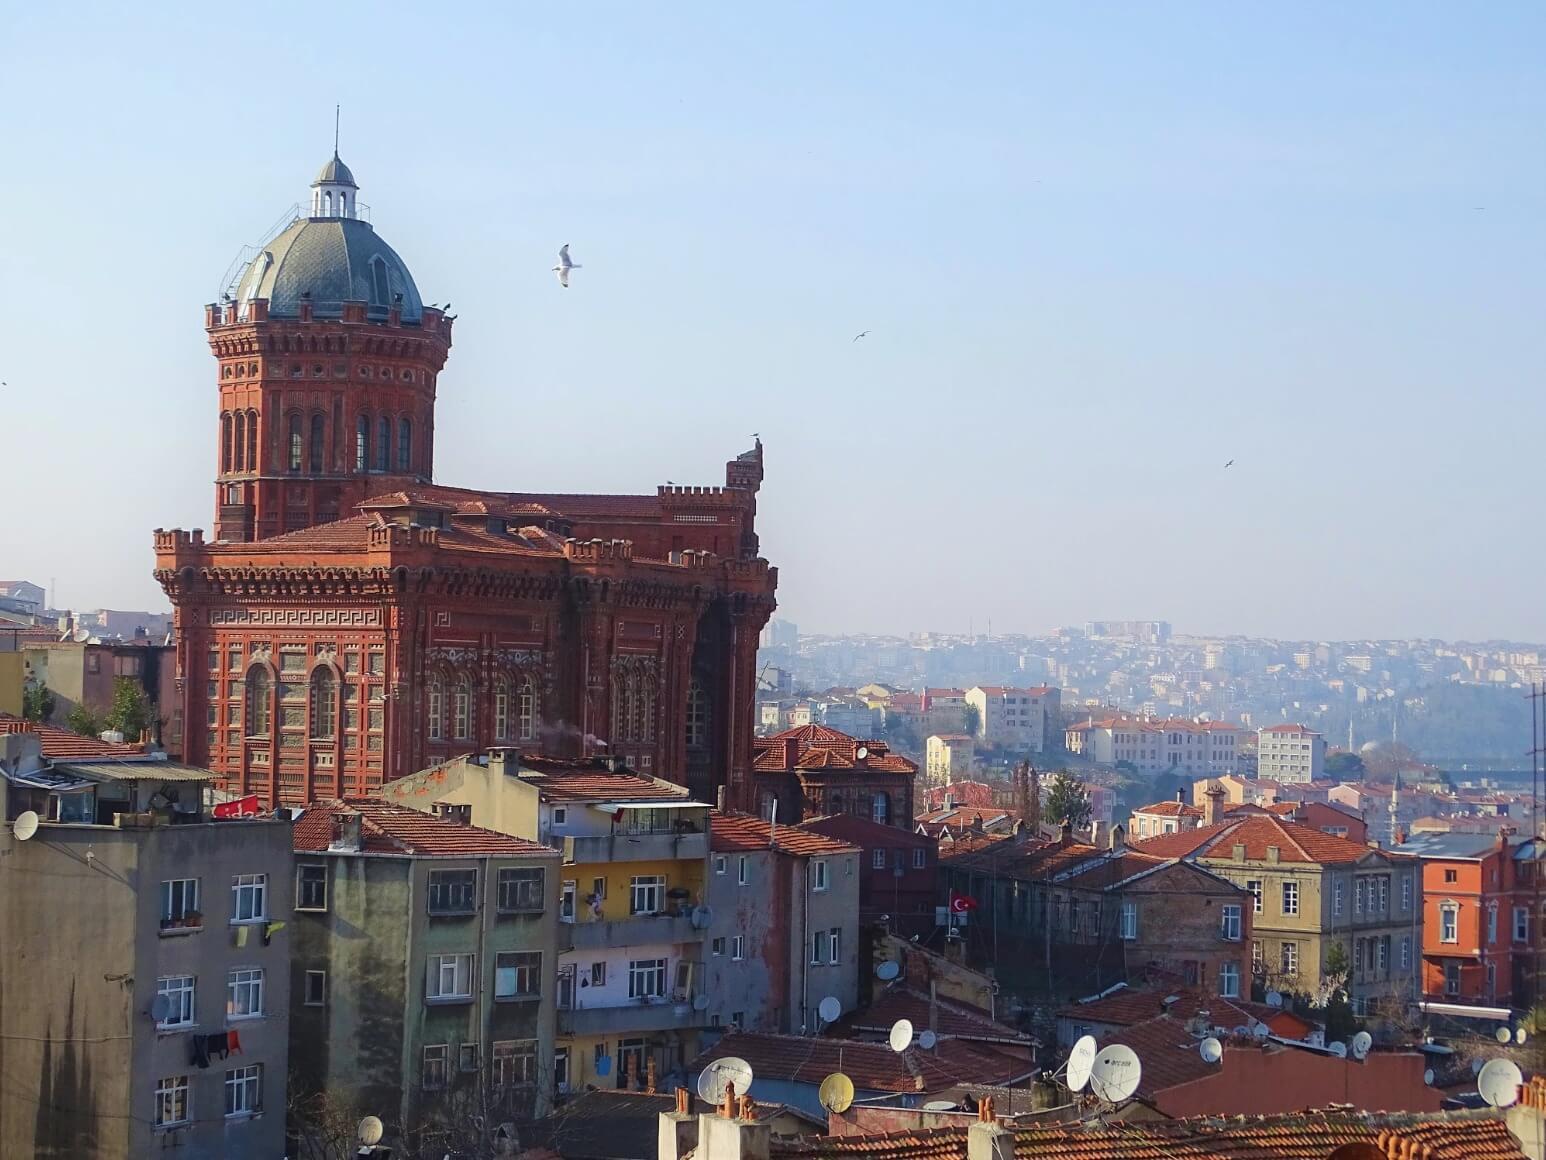 حي بلاط في اسطنبول